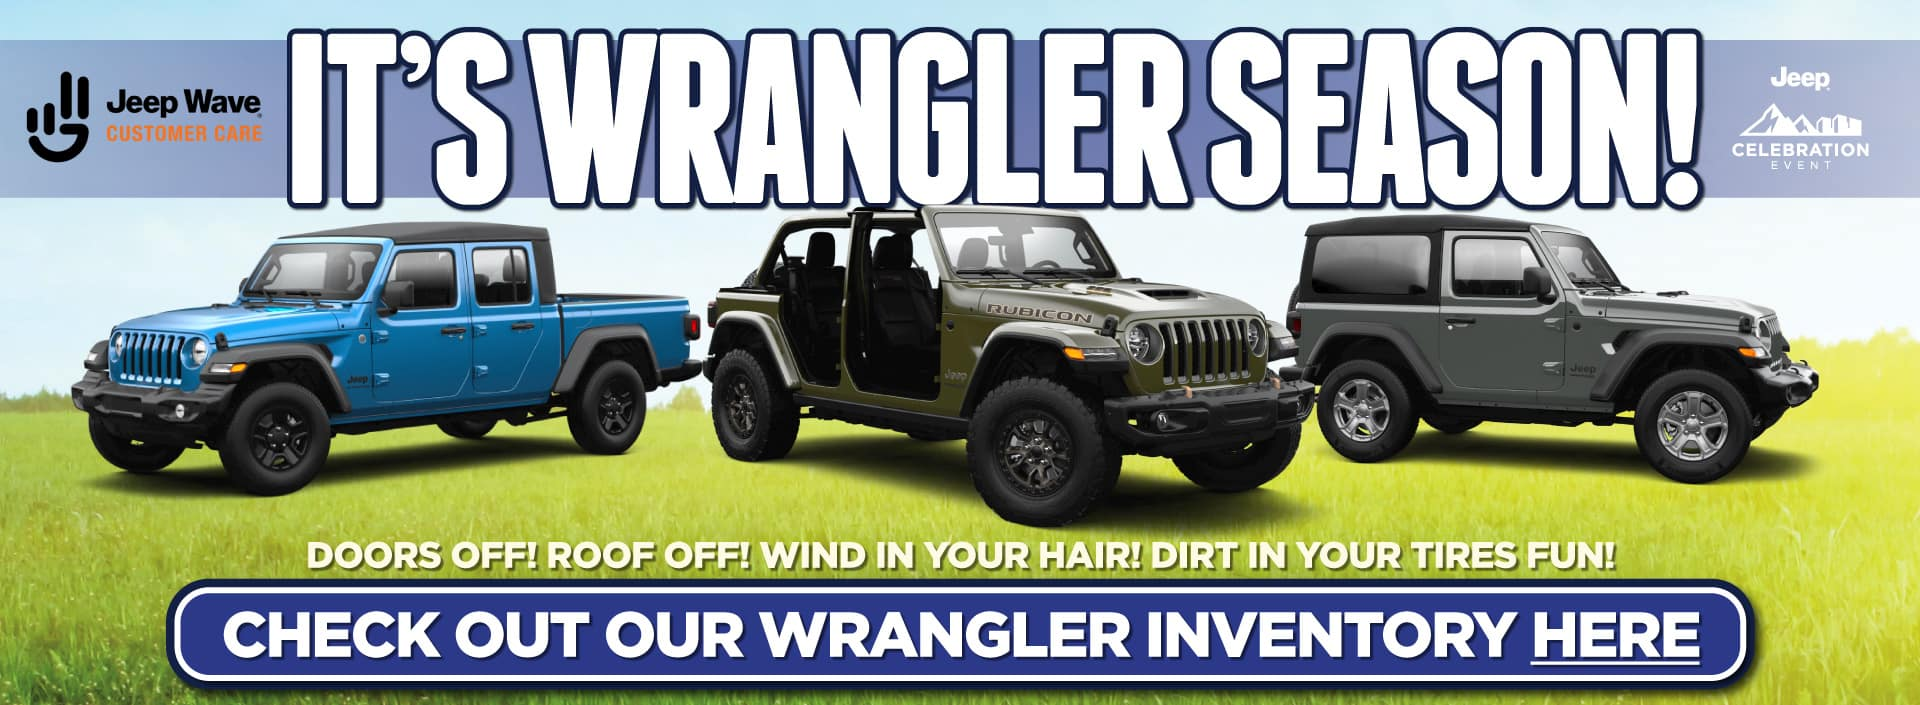 It's Wrangler Season! Check out our Wrangler Inventory Now!